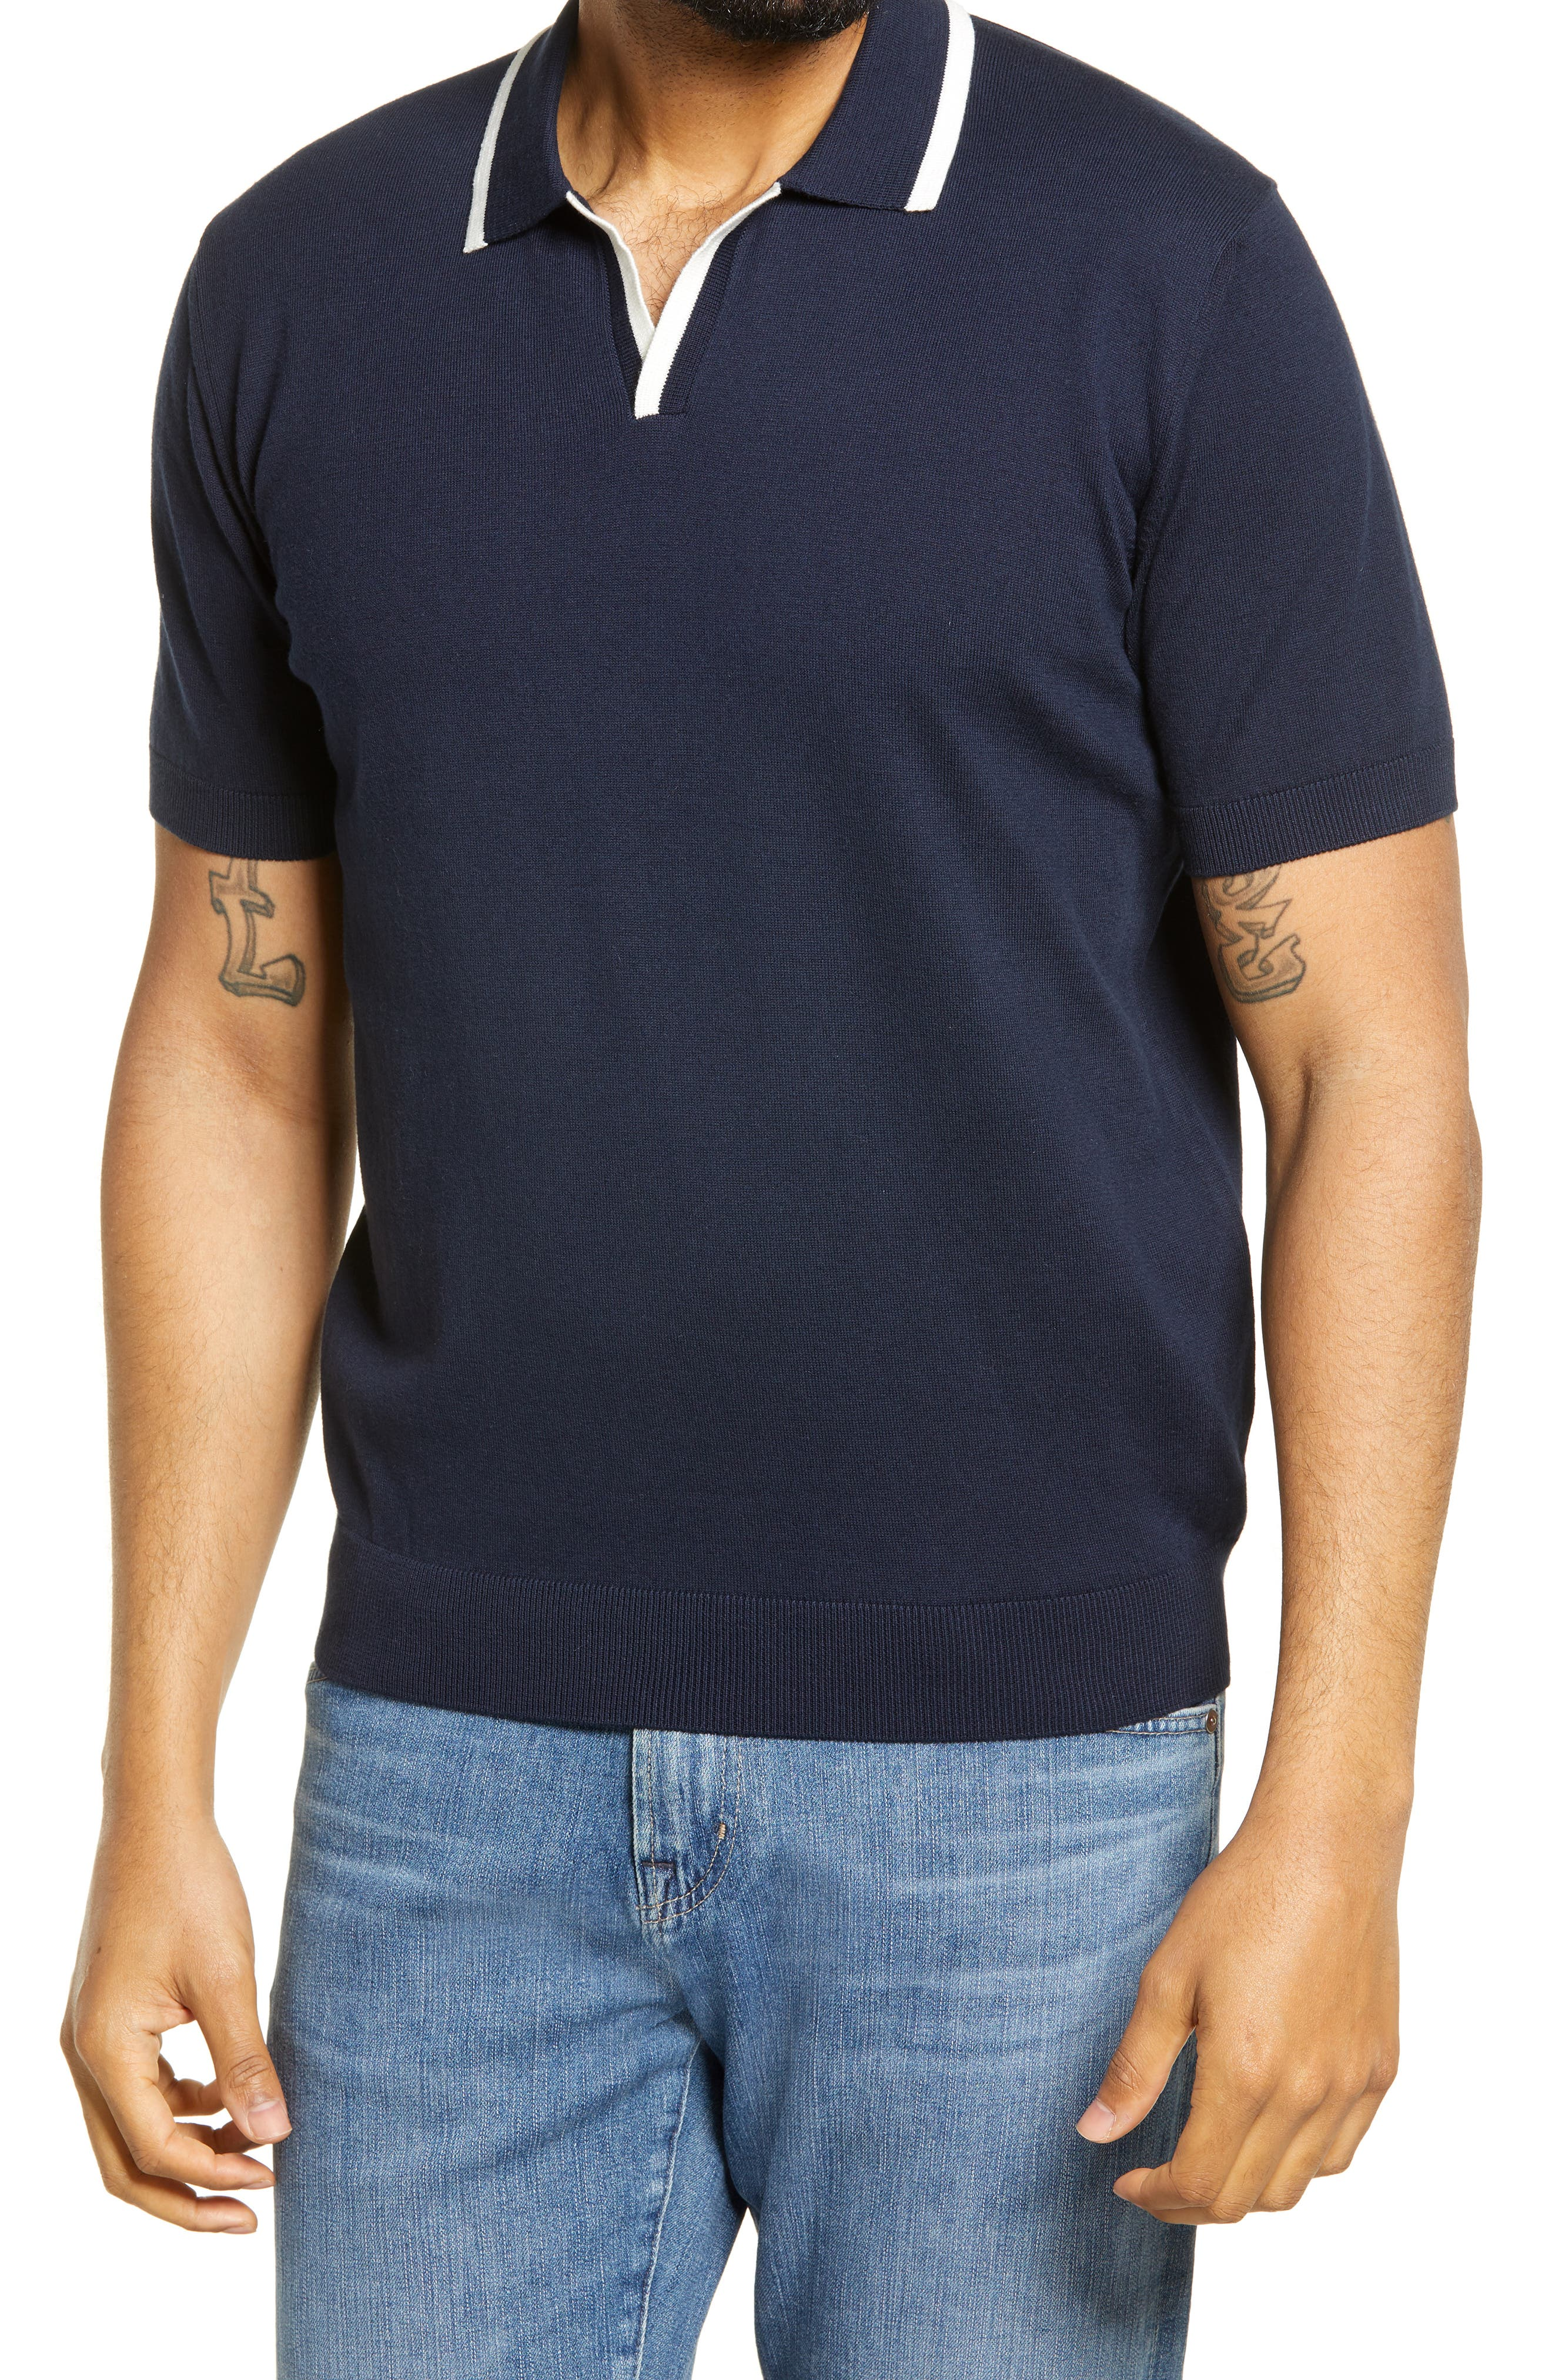 1940s Men's Clothing Mens Bugatchi Short Sleeve Sweater Size Medium - Blue $129.00 AT vintagedancer.com